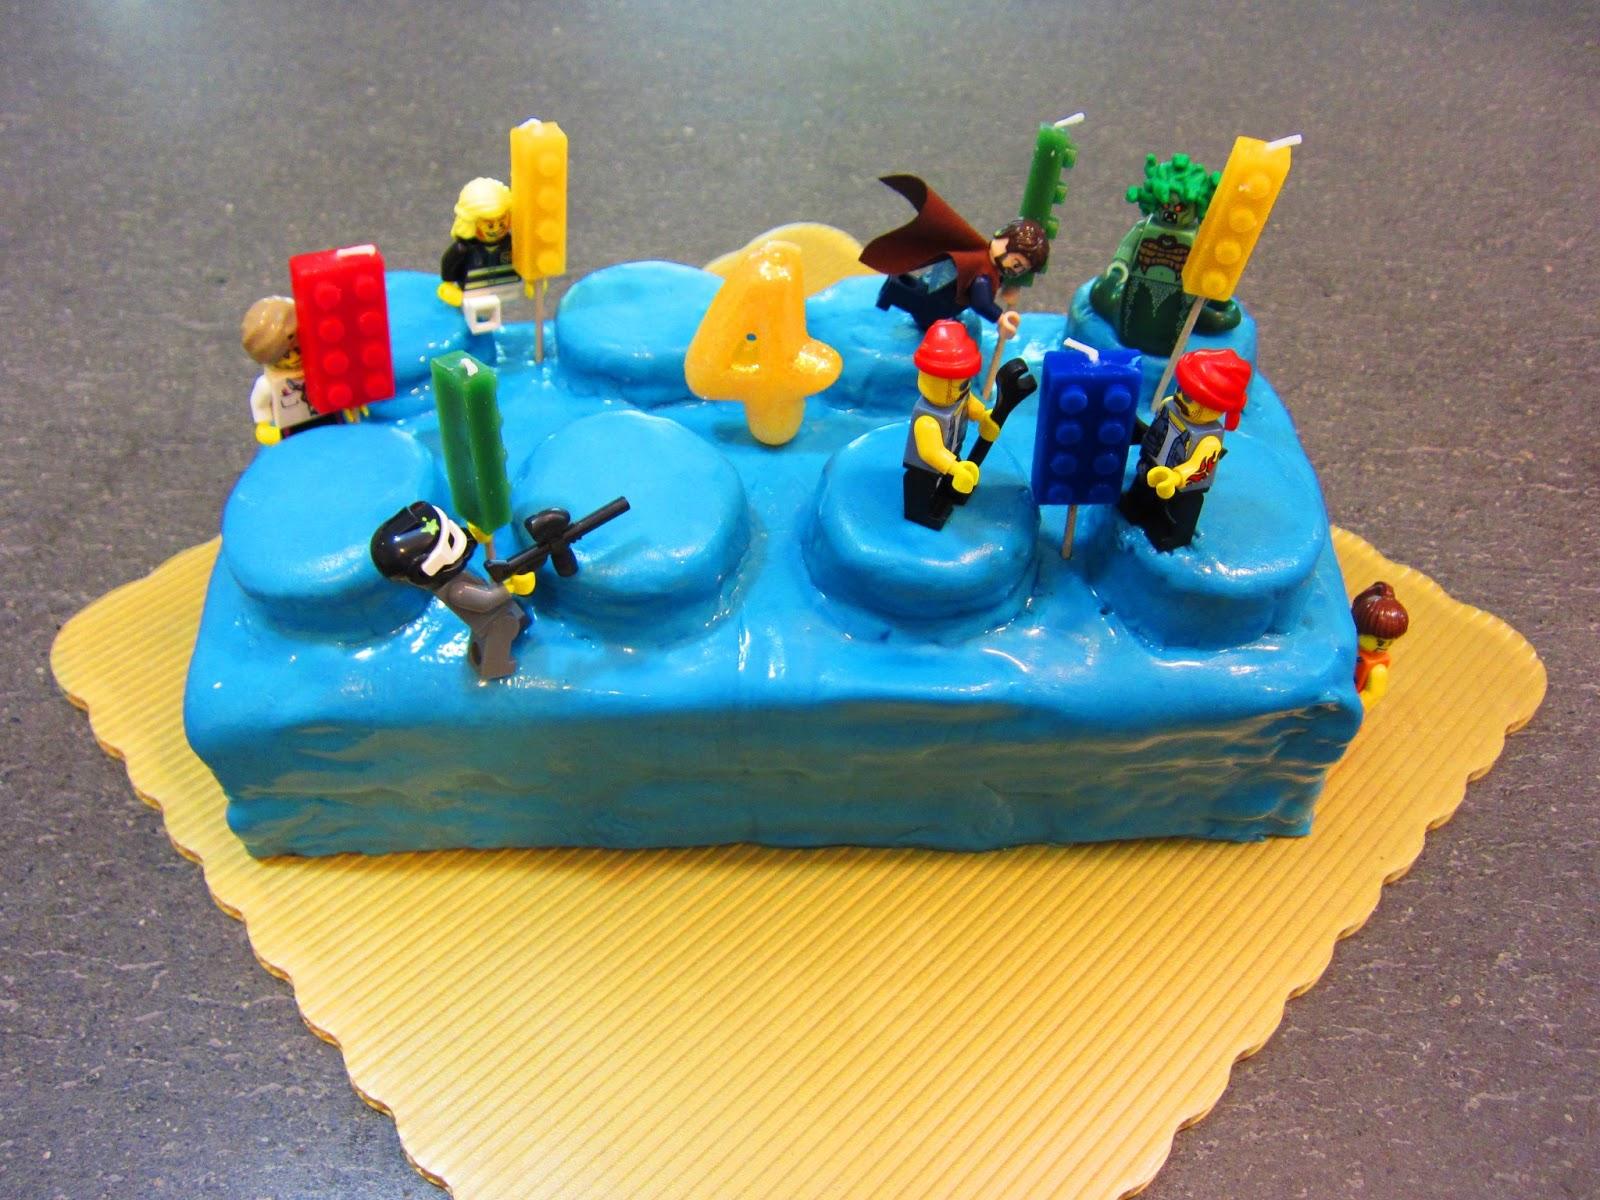 How To Make A Lego Brick Cake With Fondant